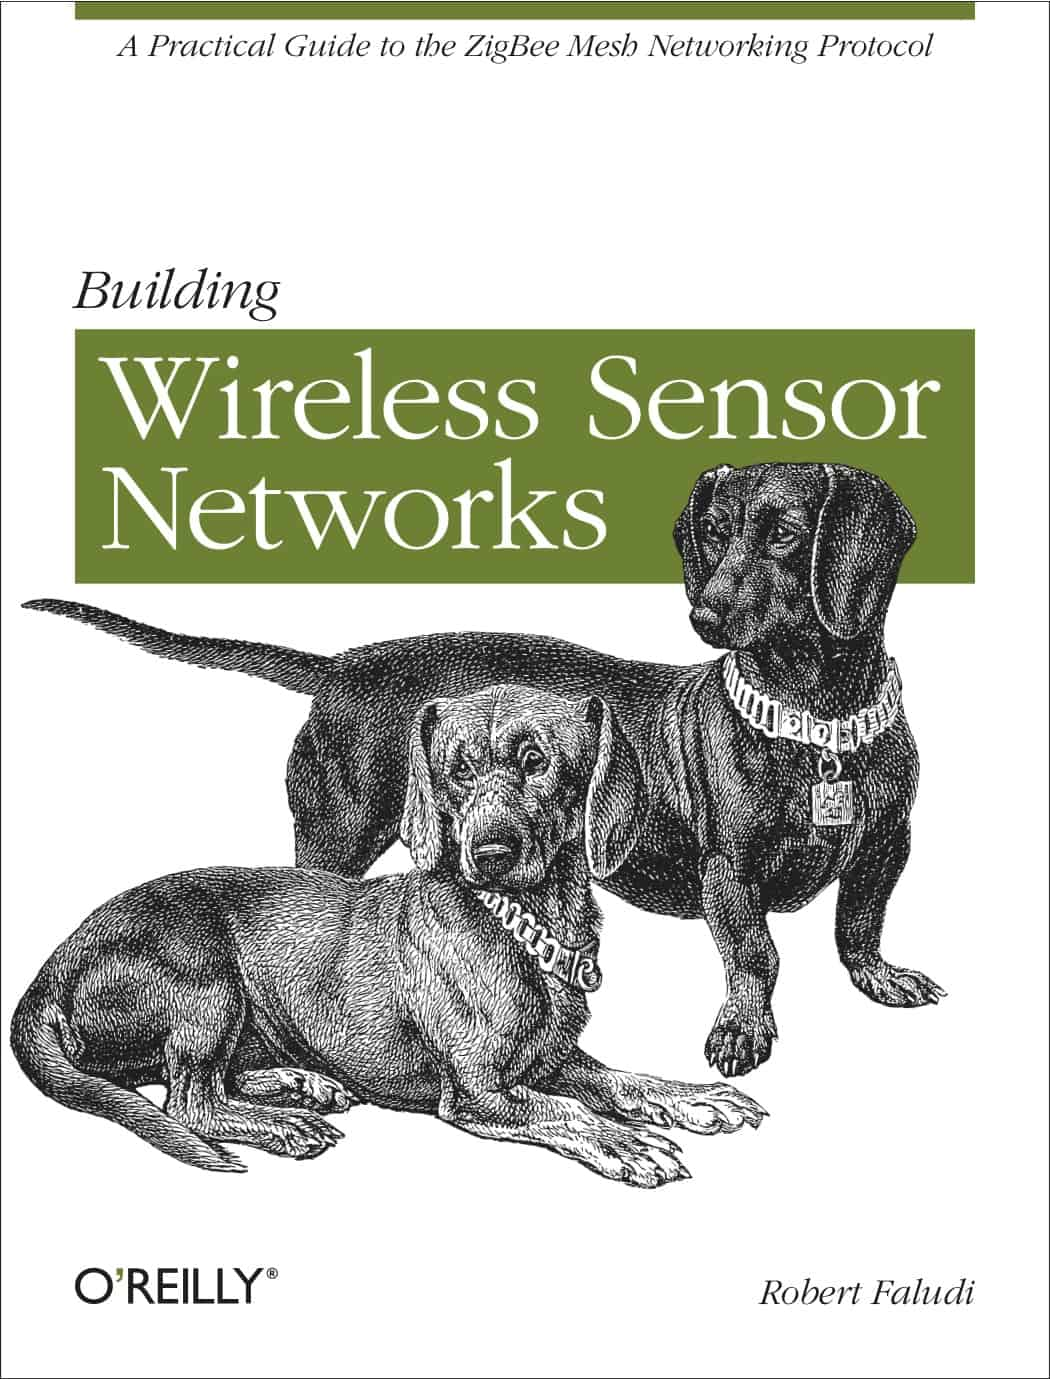 Building Wireless Sensor Networks by Rob Faludi